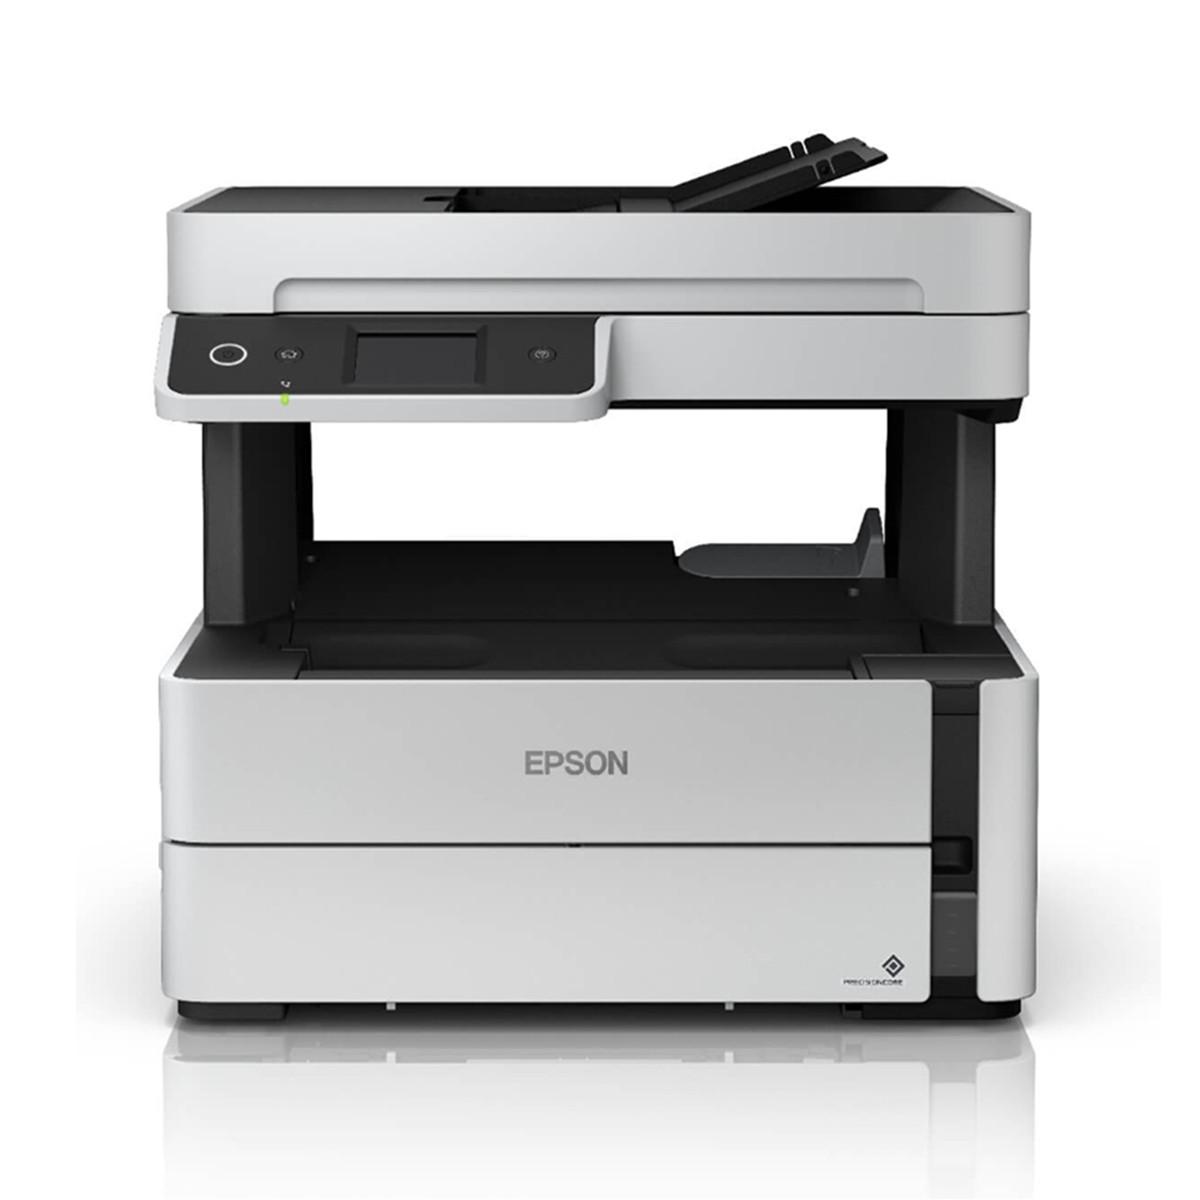 Impressora Epson M3180 EcoTank Multifuncional com Wireless e Duplex